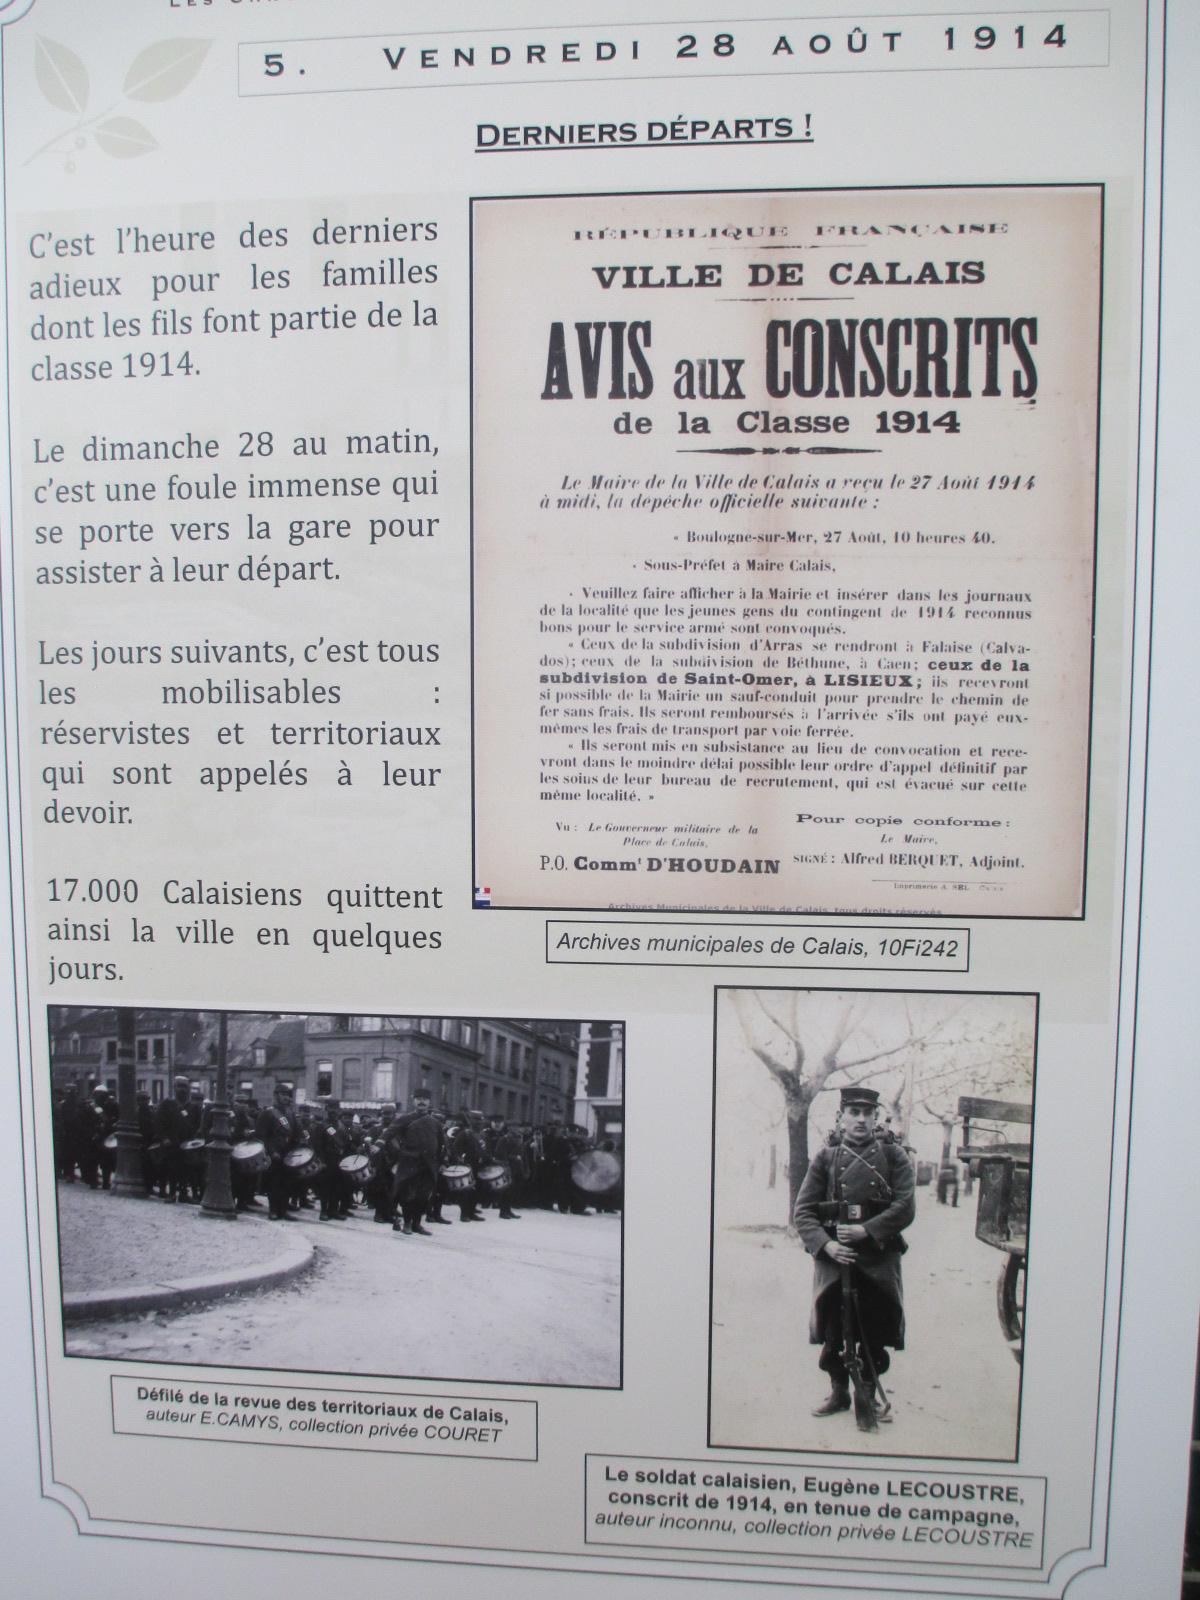 Vendredi 28 août 1914